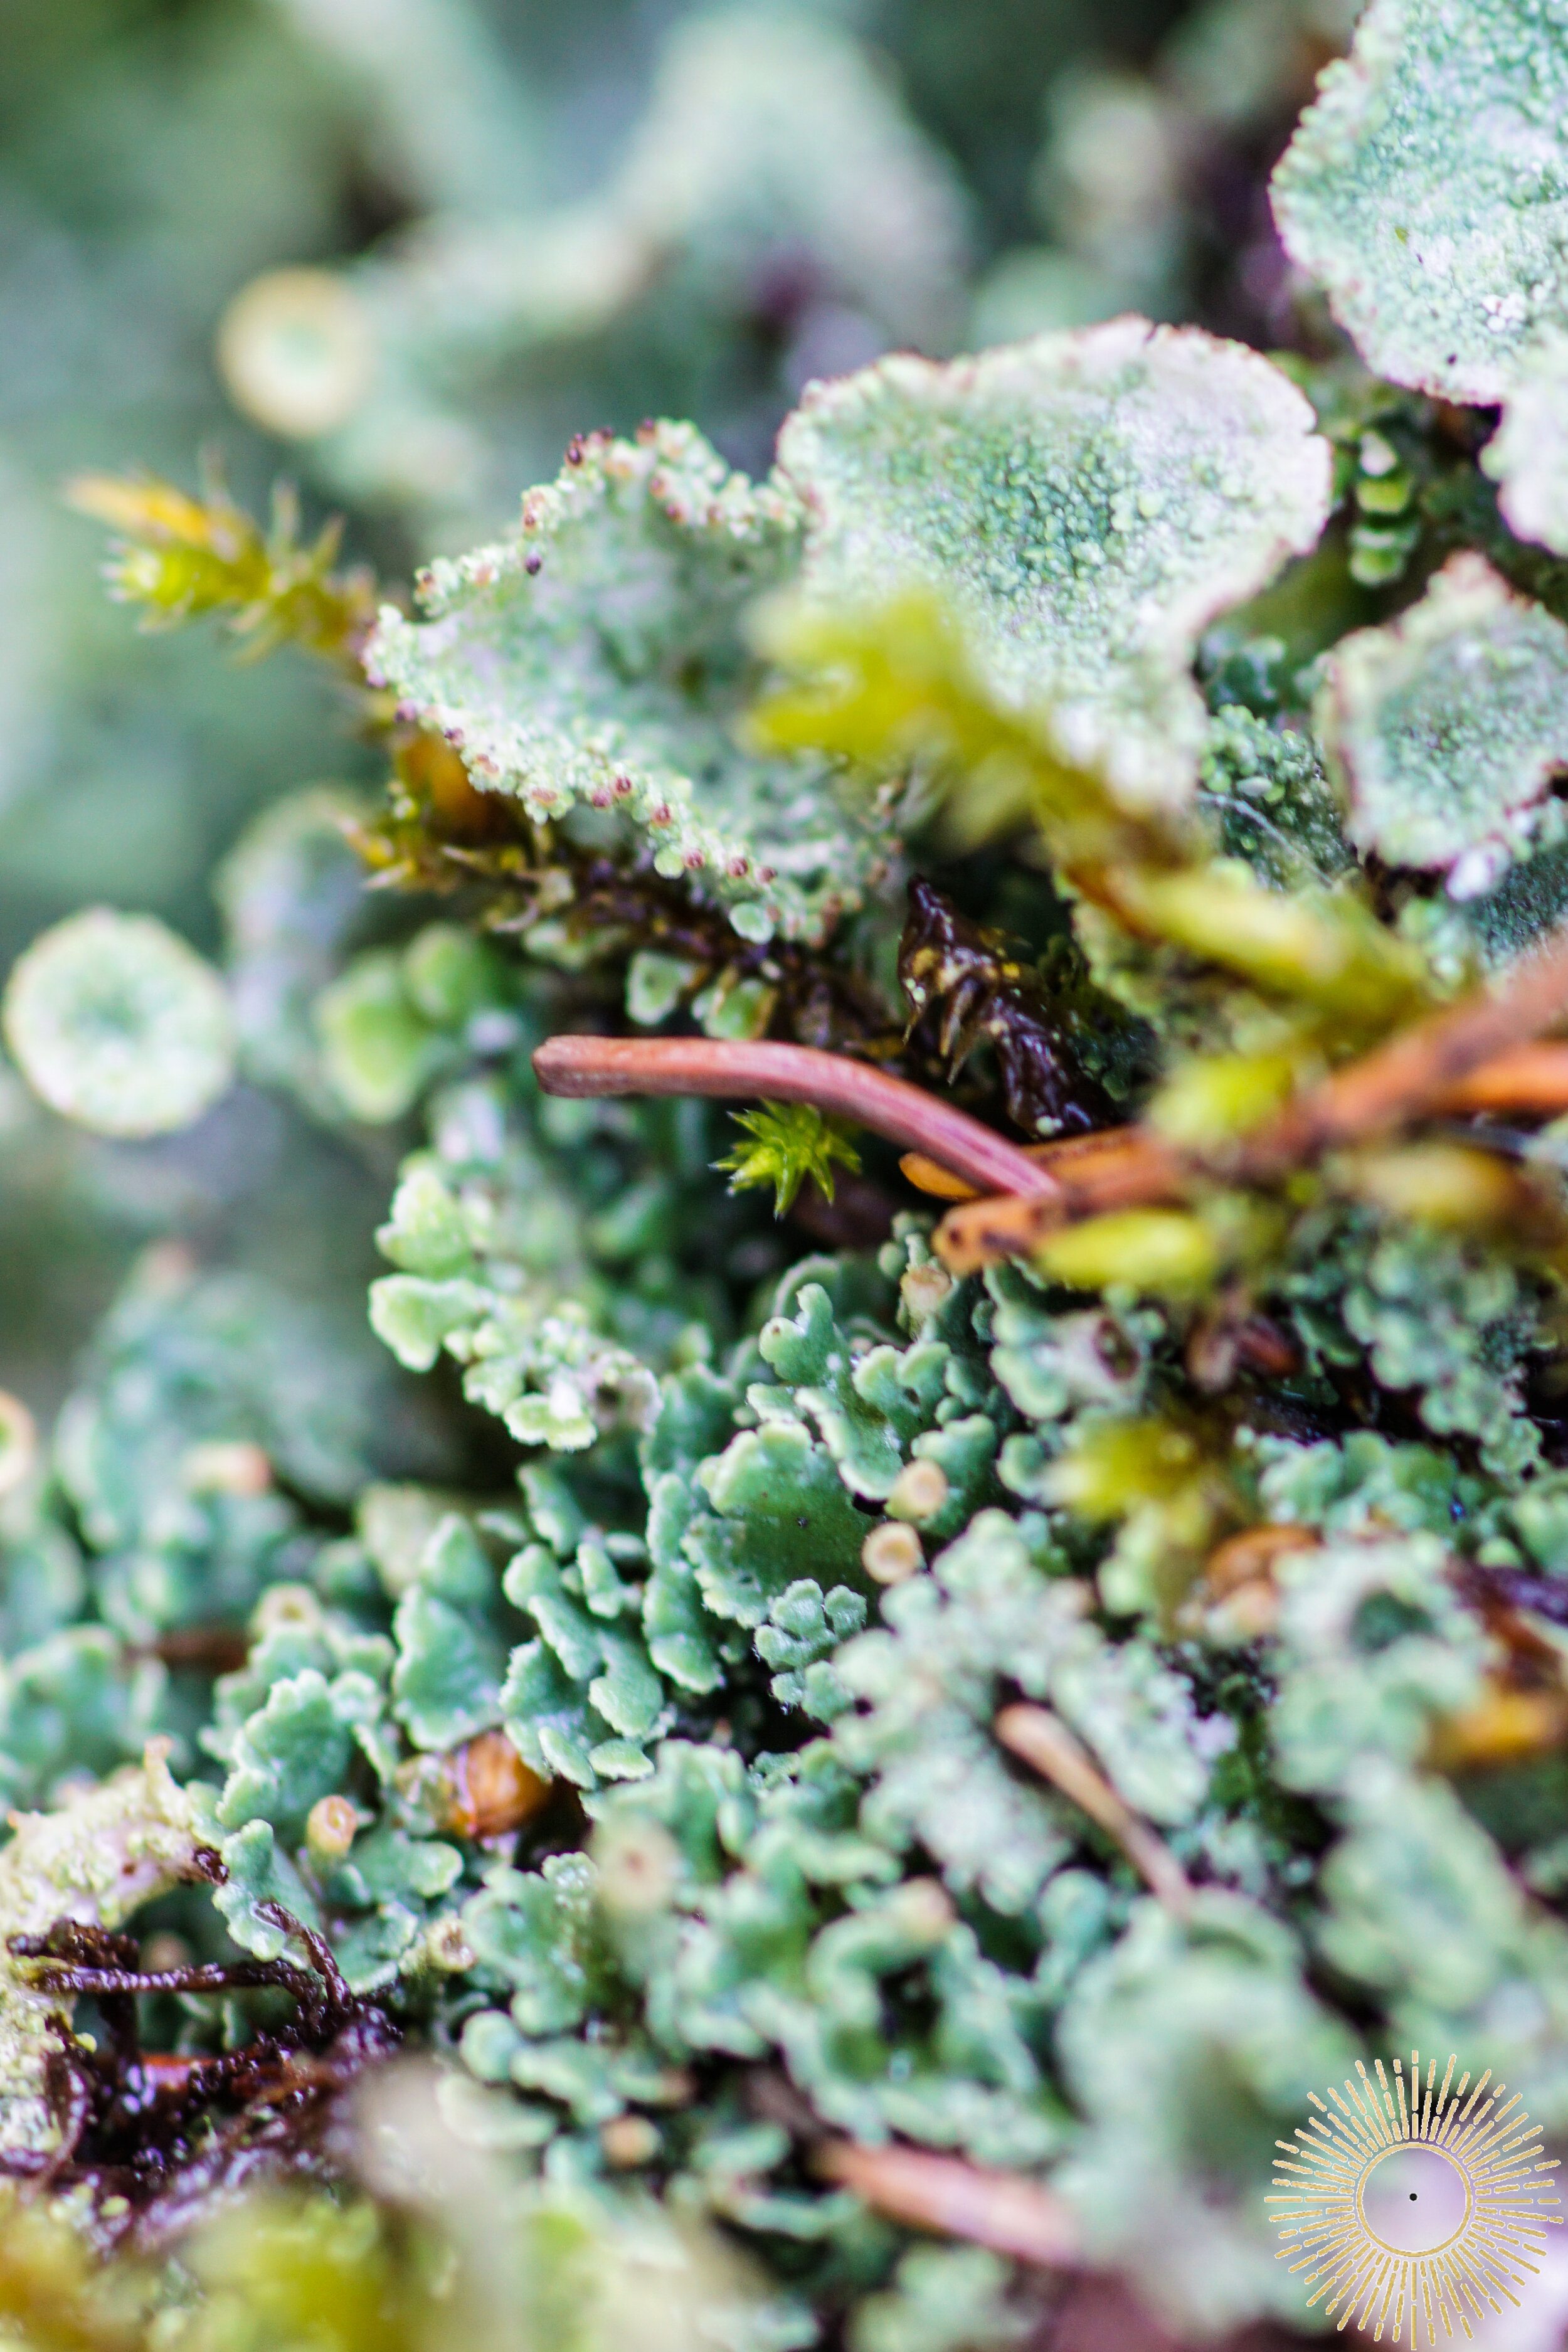 Little Worlds - Micro Photography - Duluth, Minnesota - Alyssa Johnson - Blind Spot Creatives  - Lichen